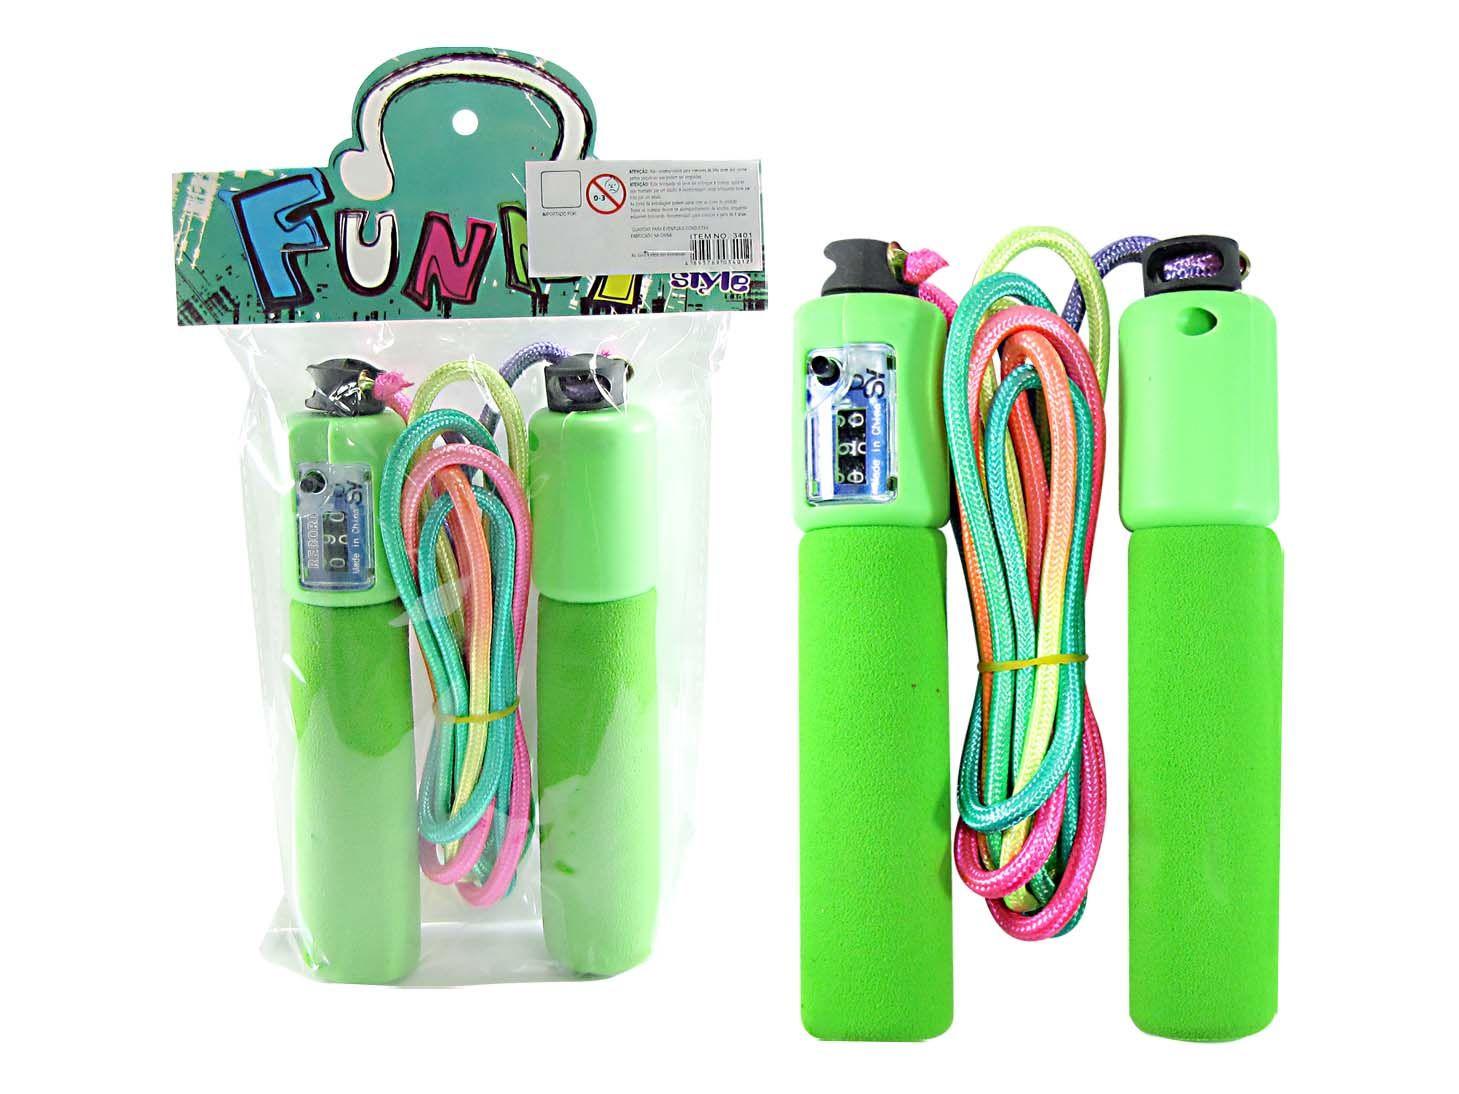 Kit 15 Pula Corda Infantil Colorido Divertido Funny Verde - 3401